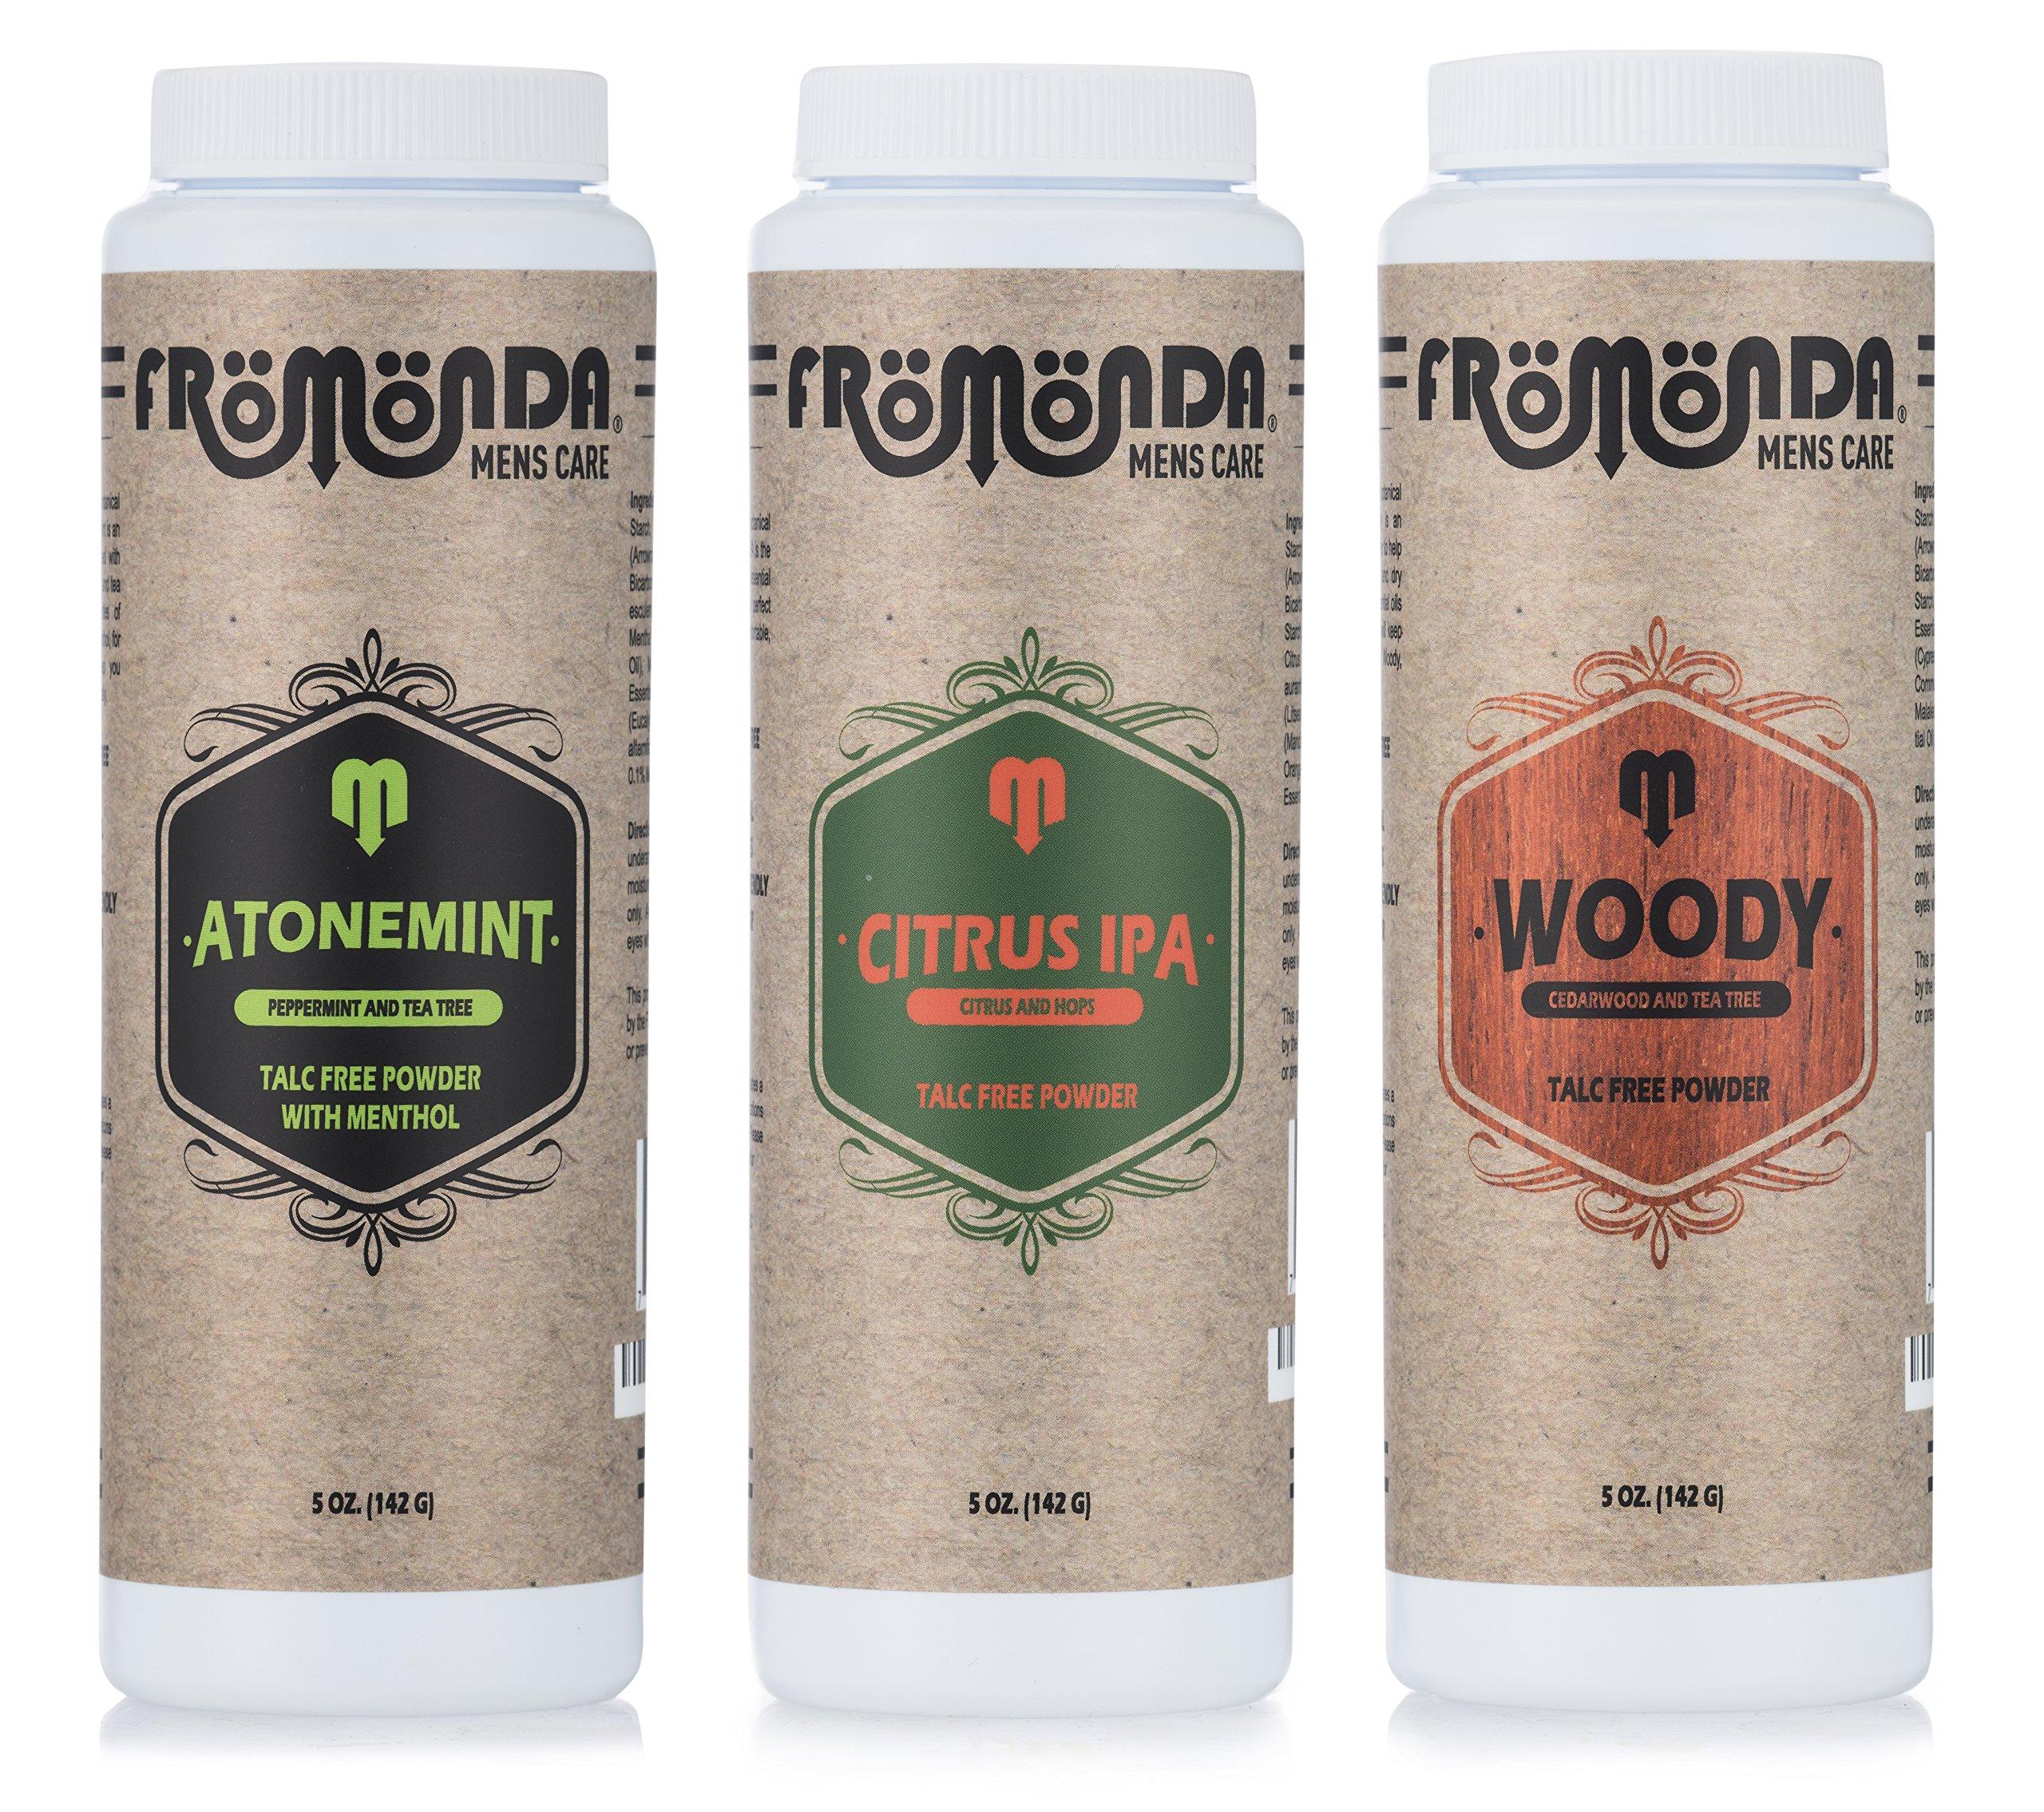 Fromonda Body Powder Multi-Scent 5 Oz 3-Pack by Fromonda